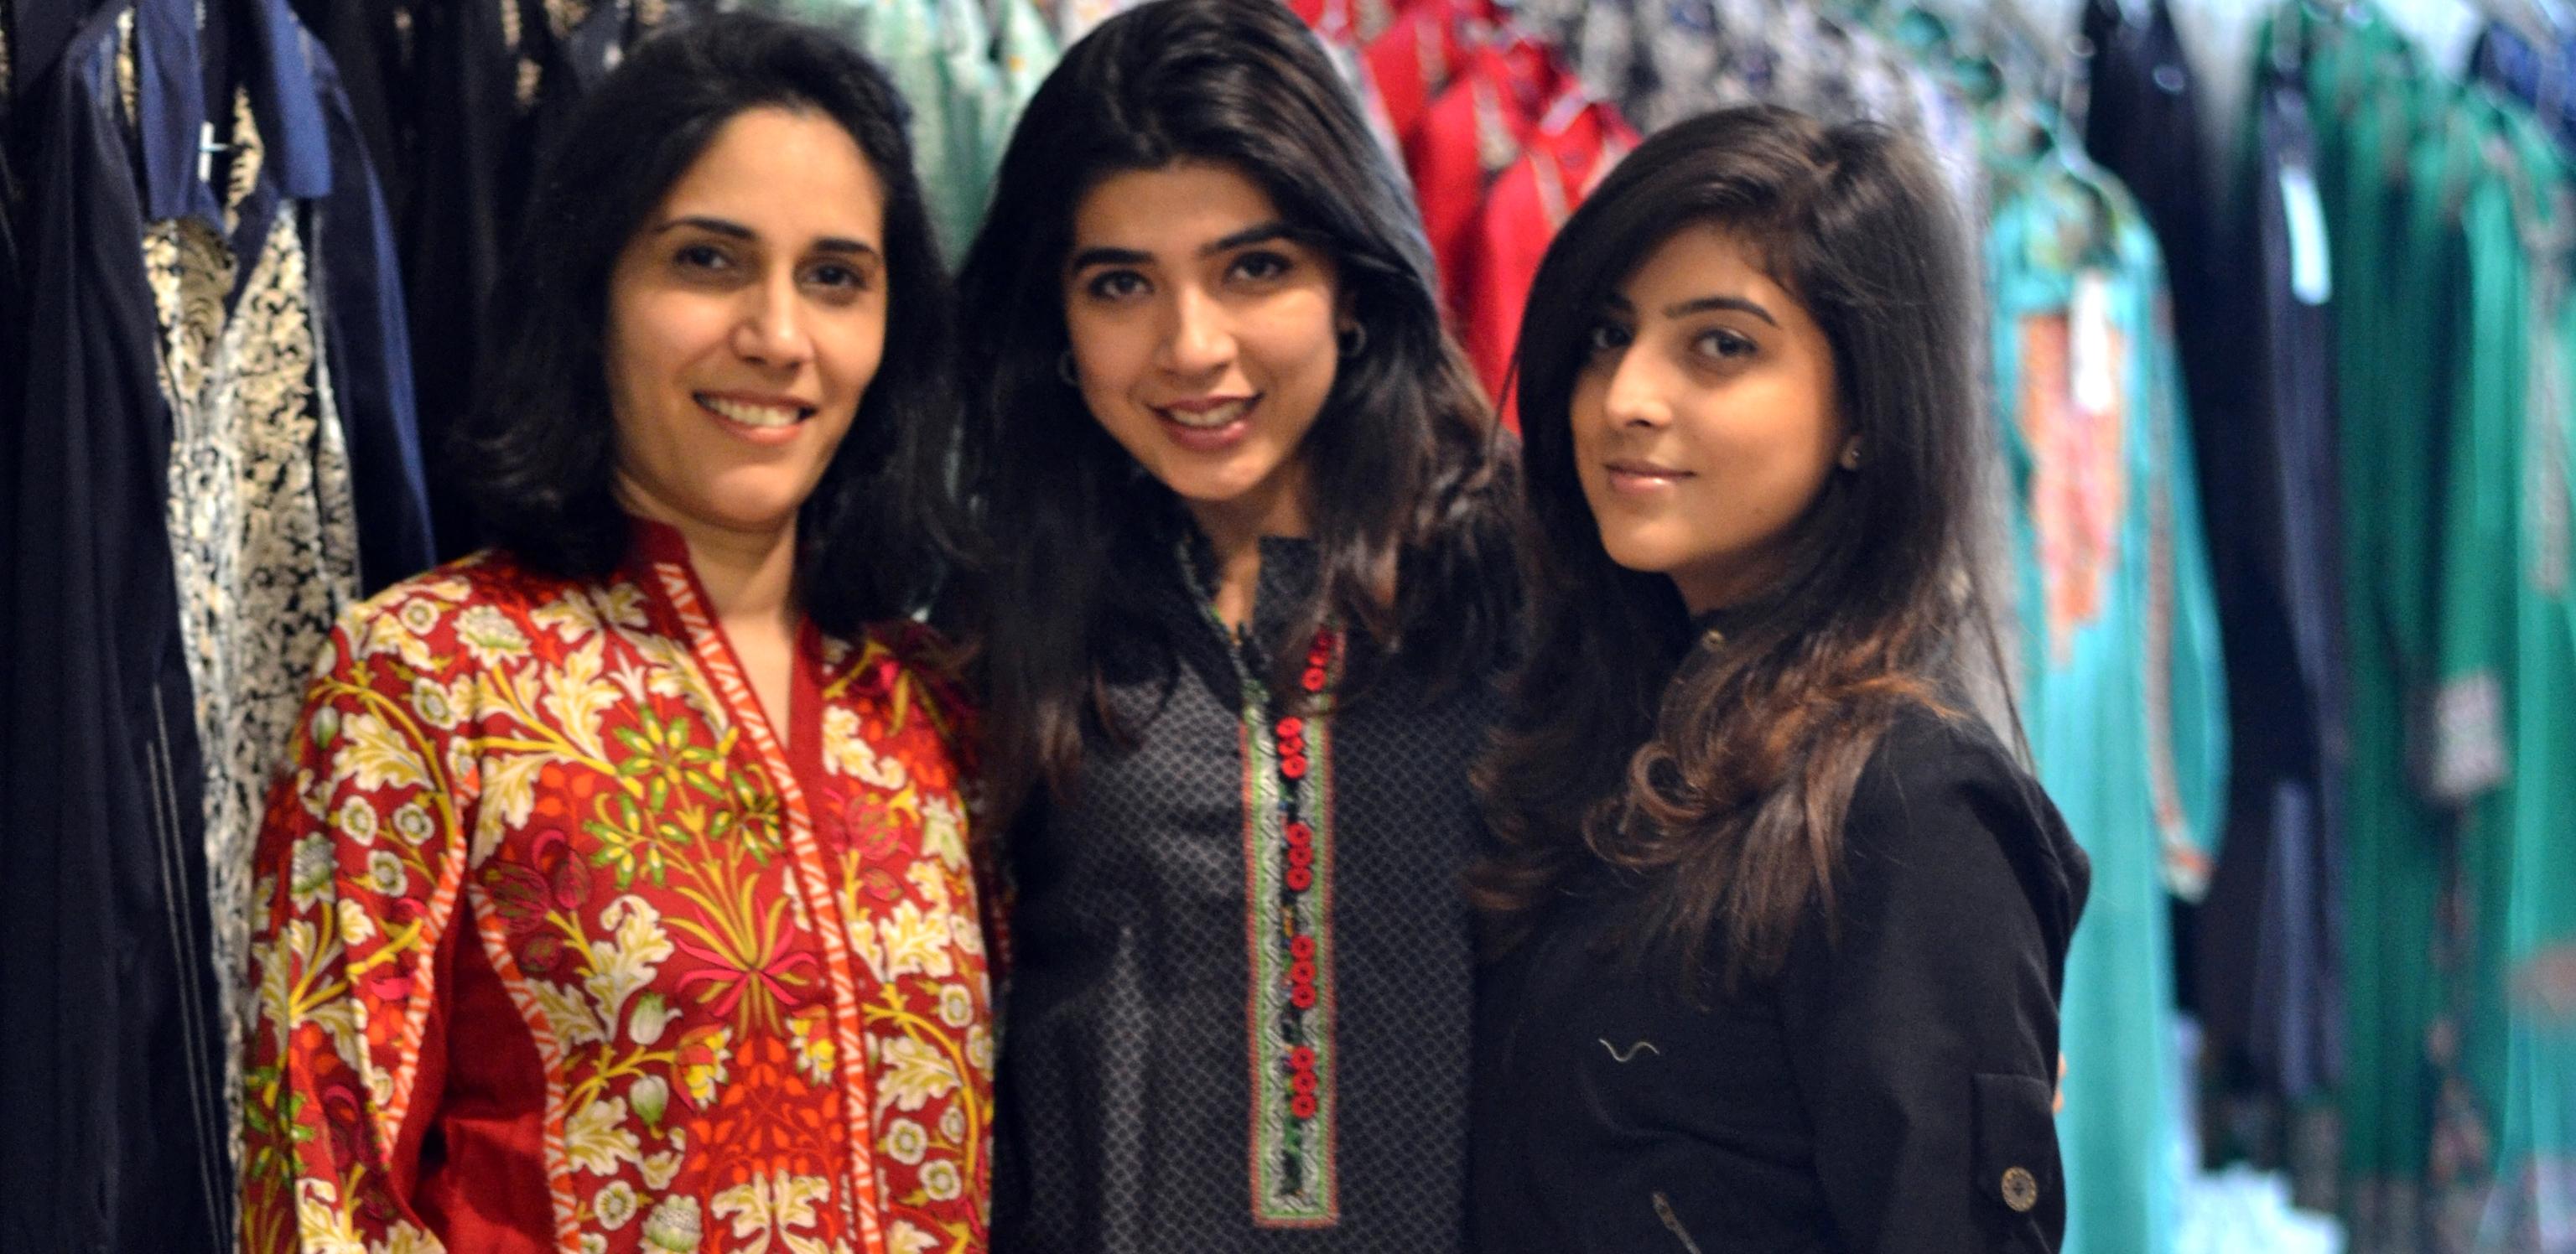 Mehreen Chaudhary Sadaf Zarrar Foha Raza